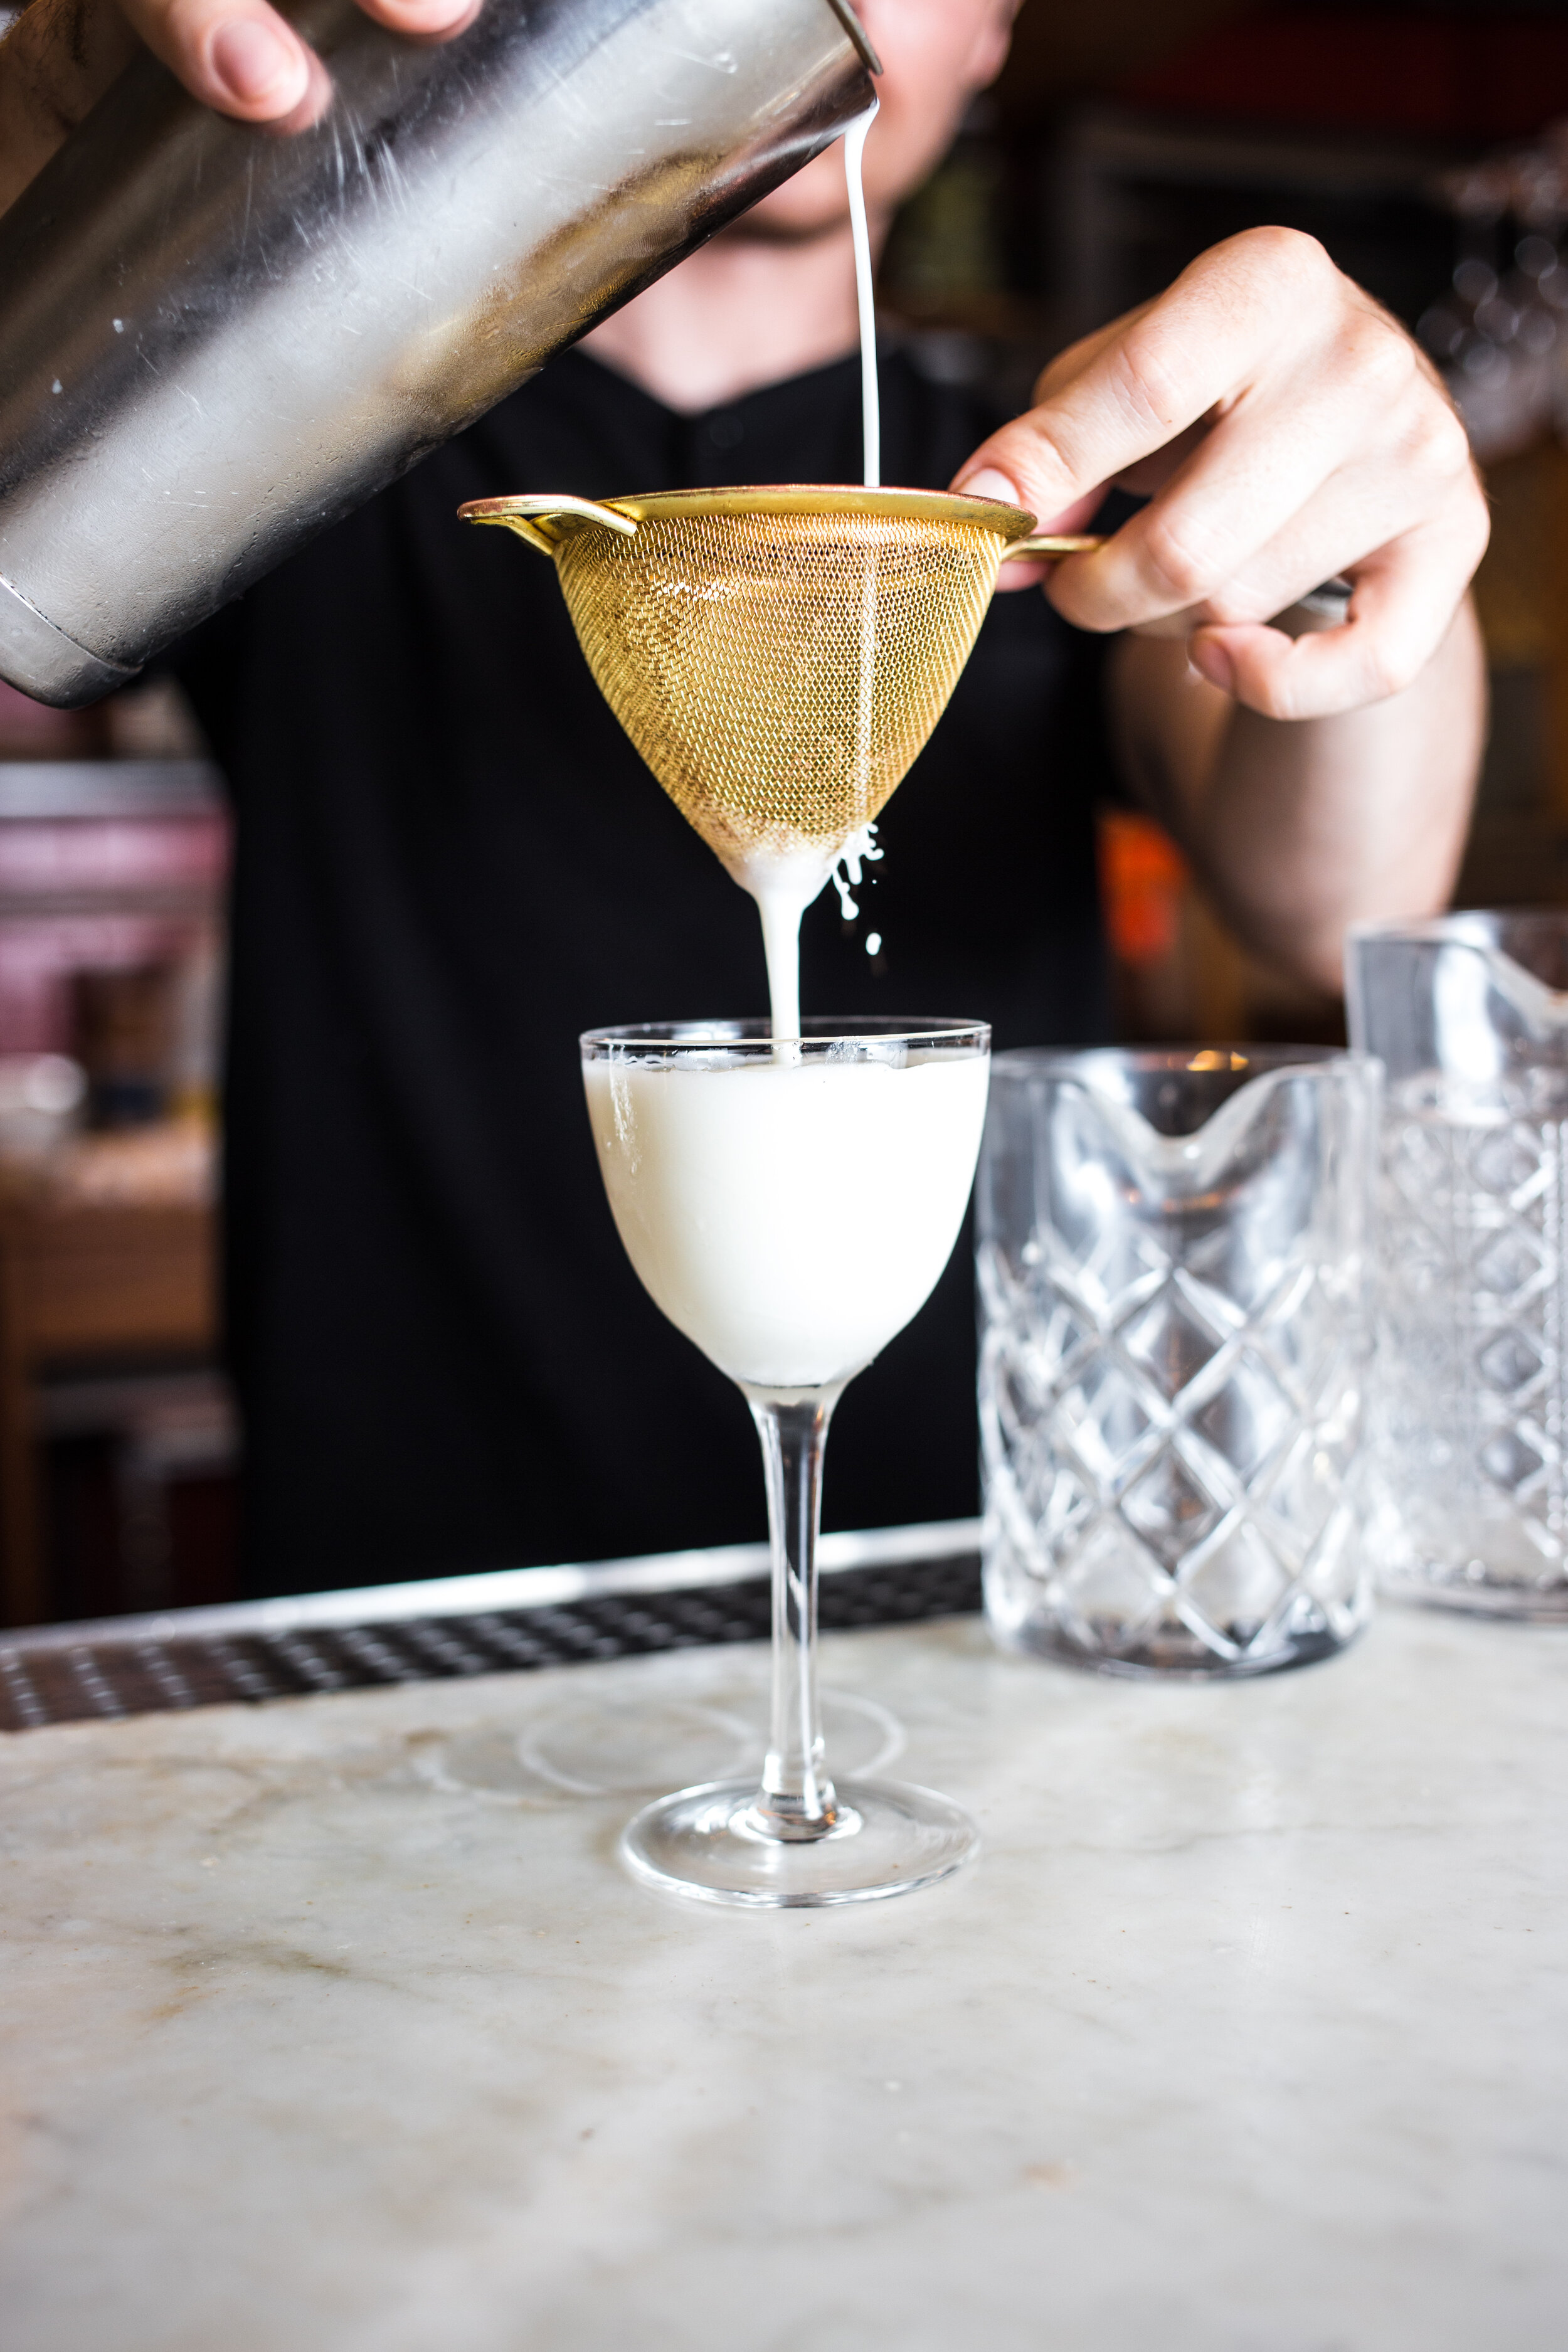 Cocktail-Drink-Bar-Photography-Katie-Foster-4095.jpg